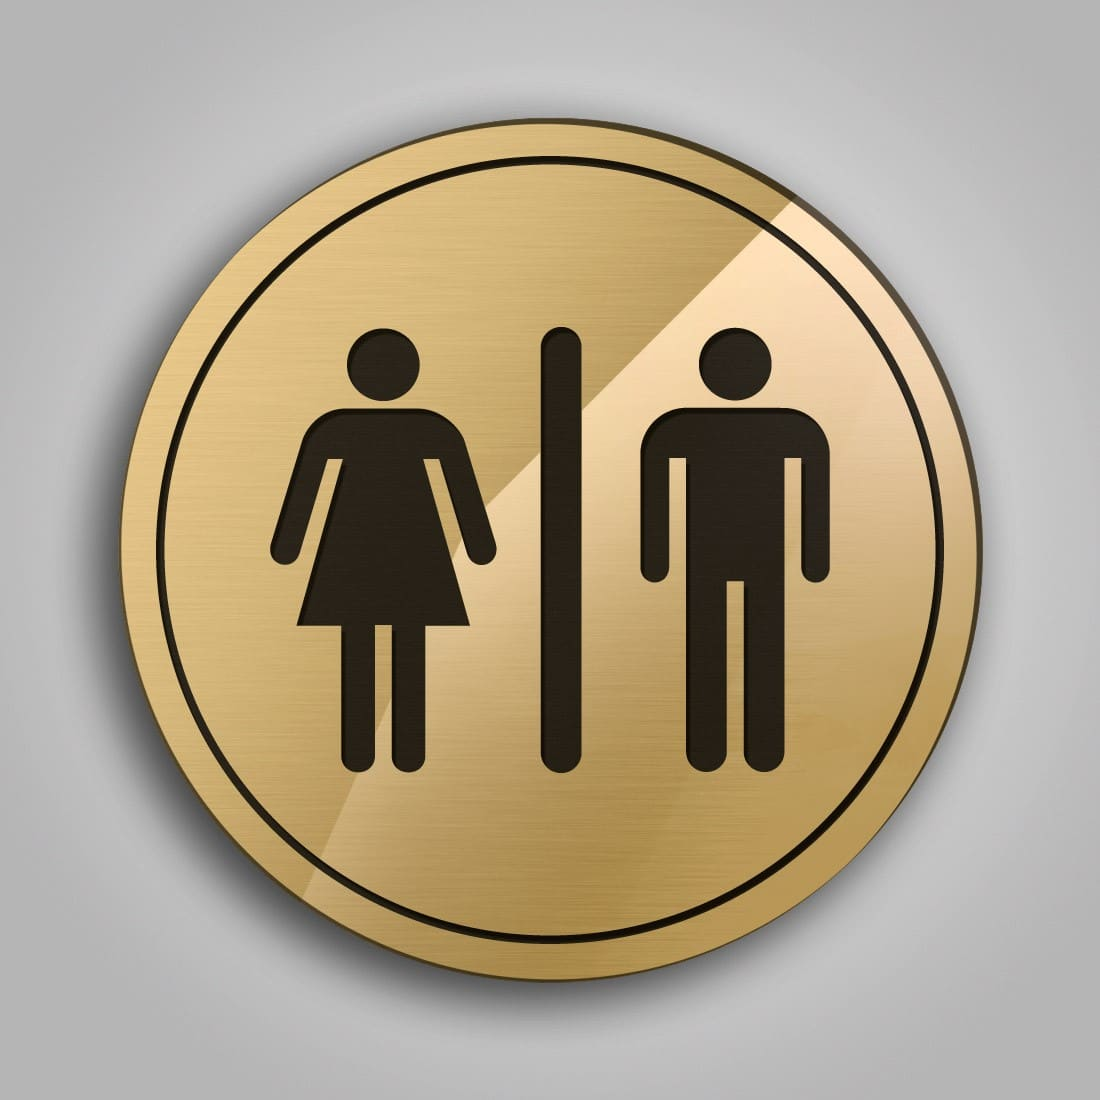 targhette e cartelli toilette - Targhe Per Toilette